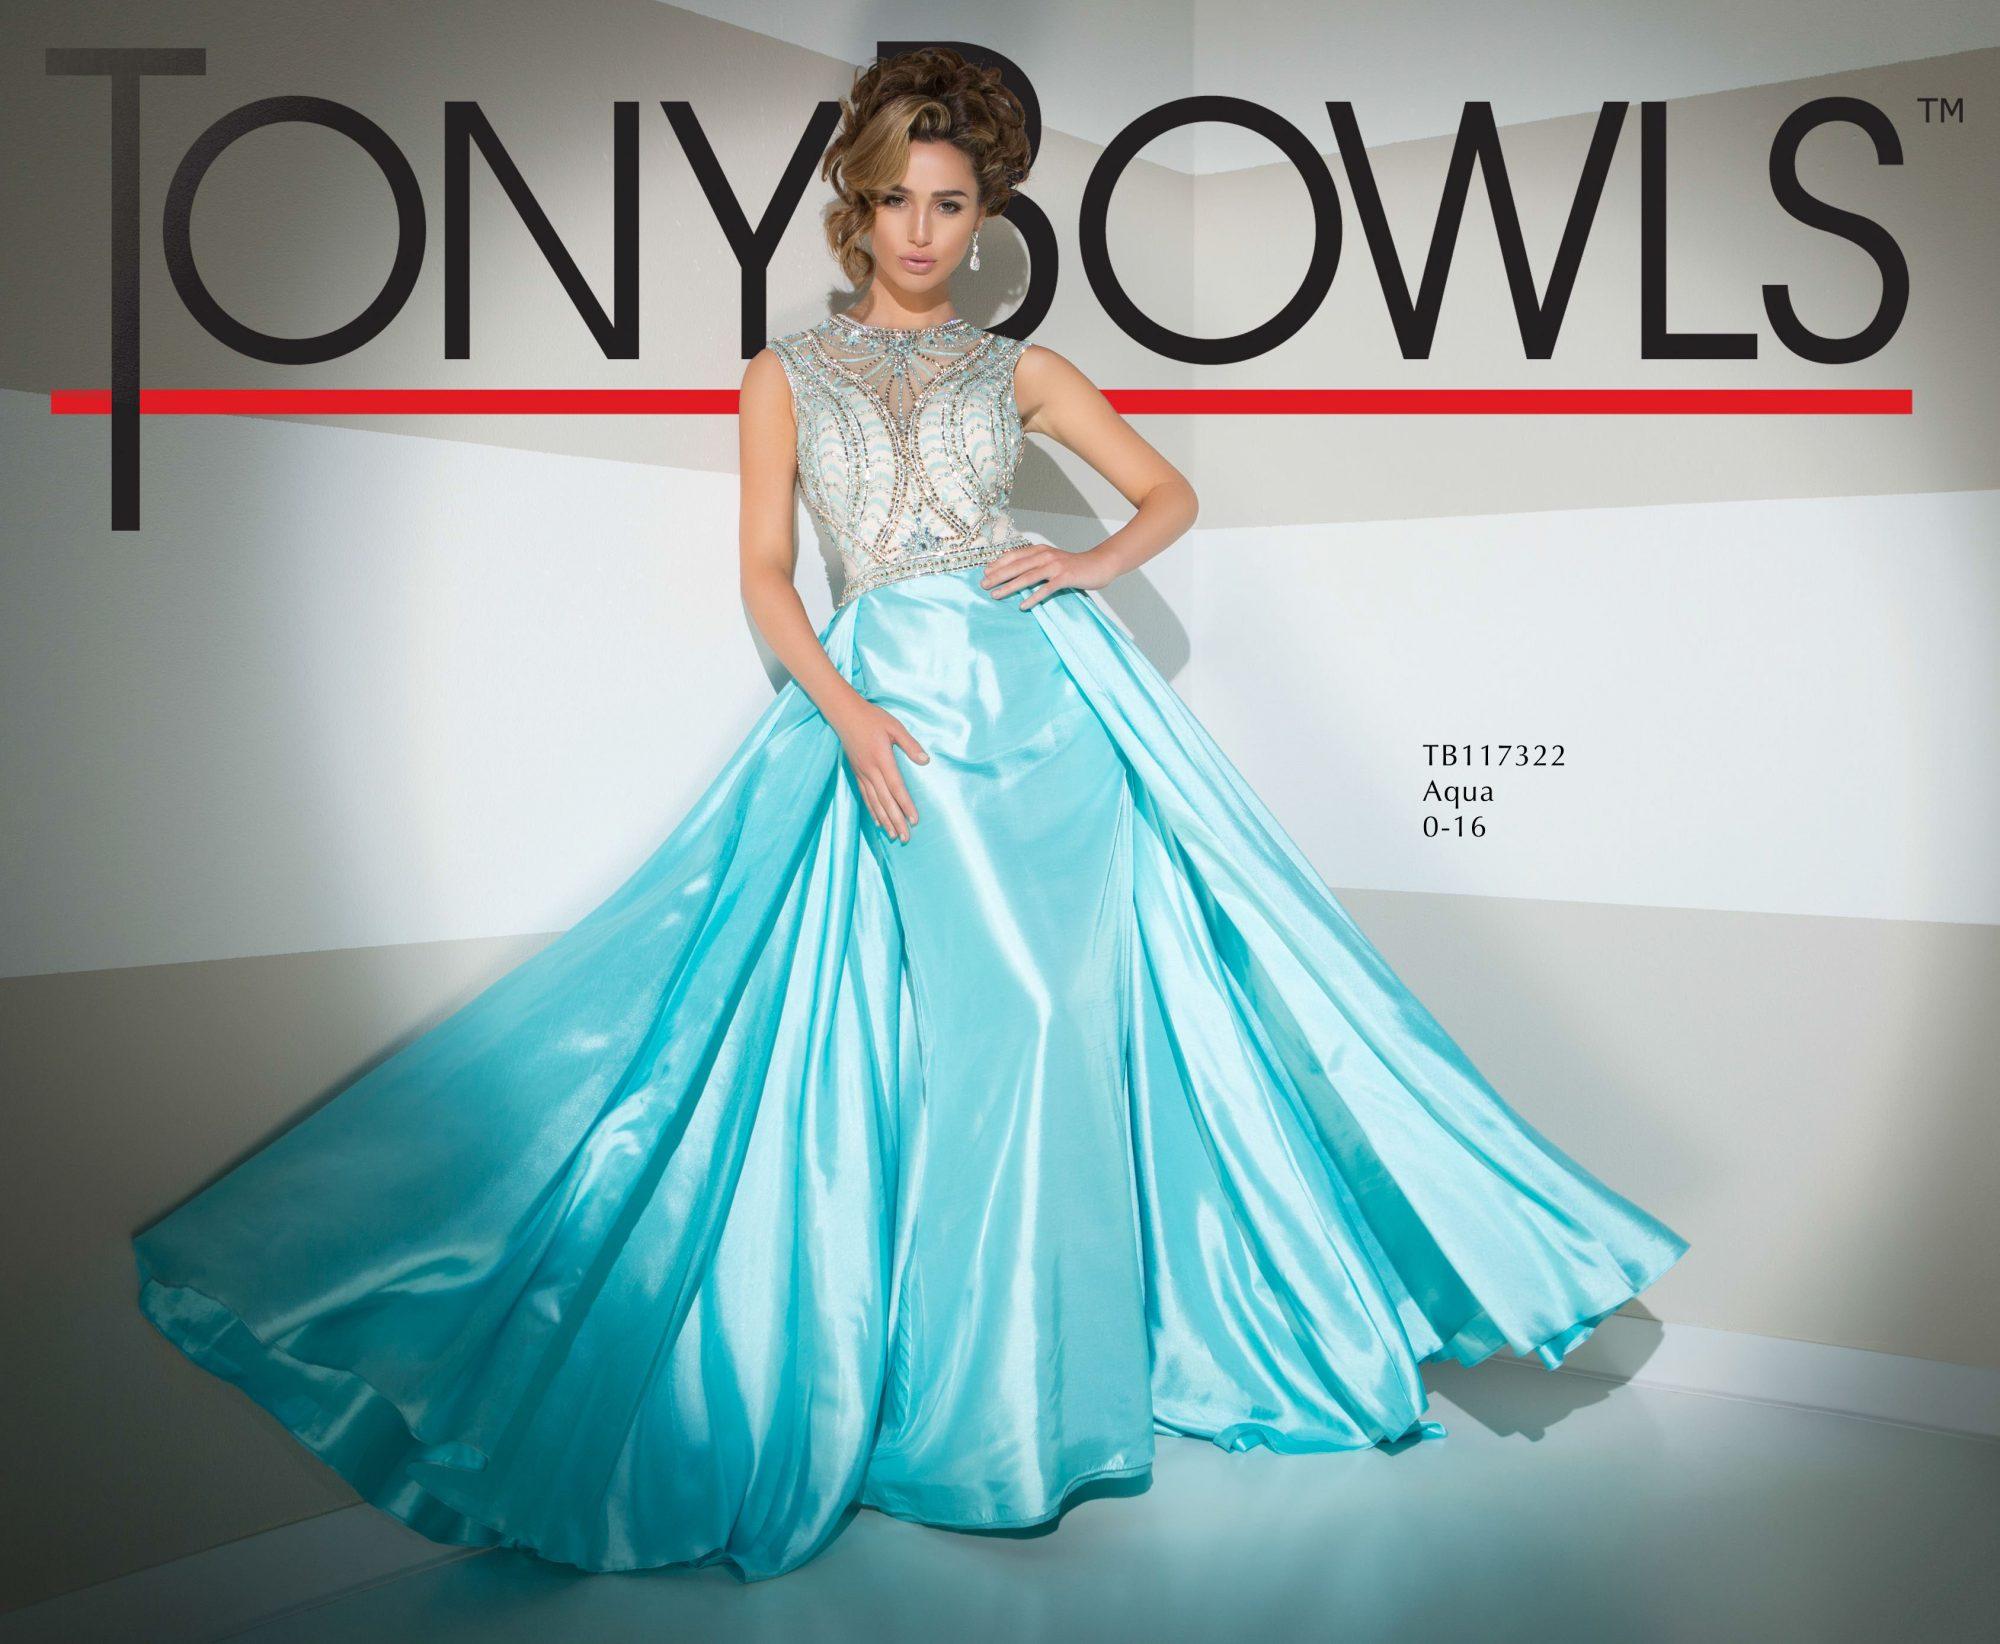 Tony Bowls Prom Dresses Turquoise